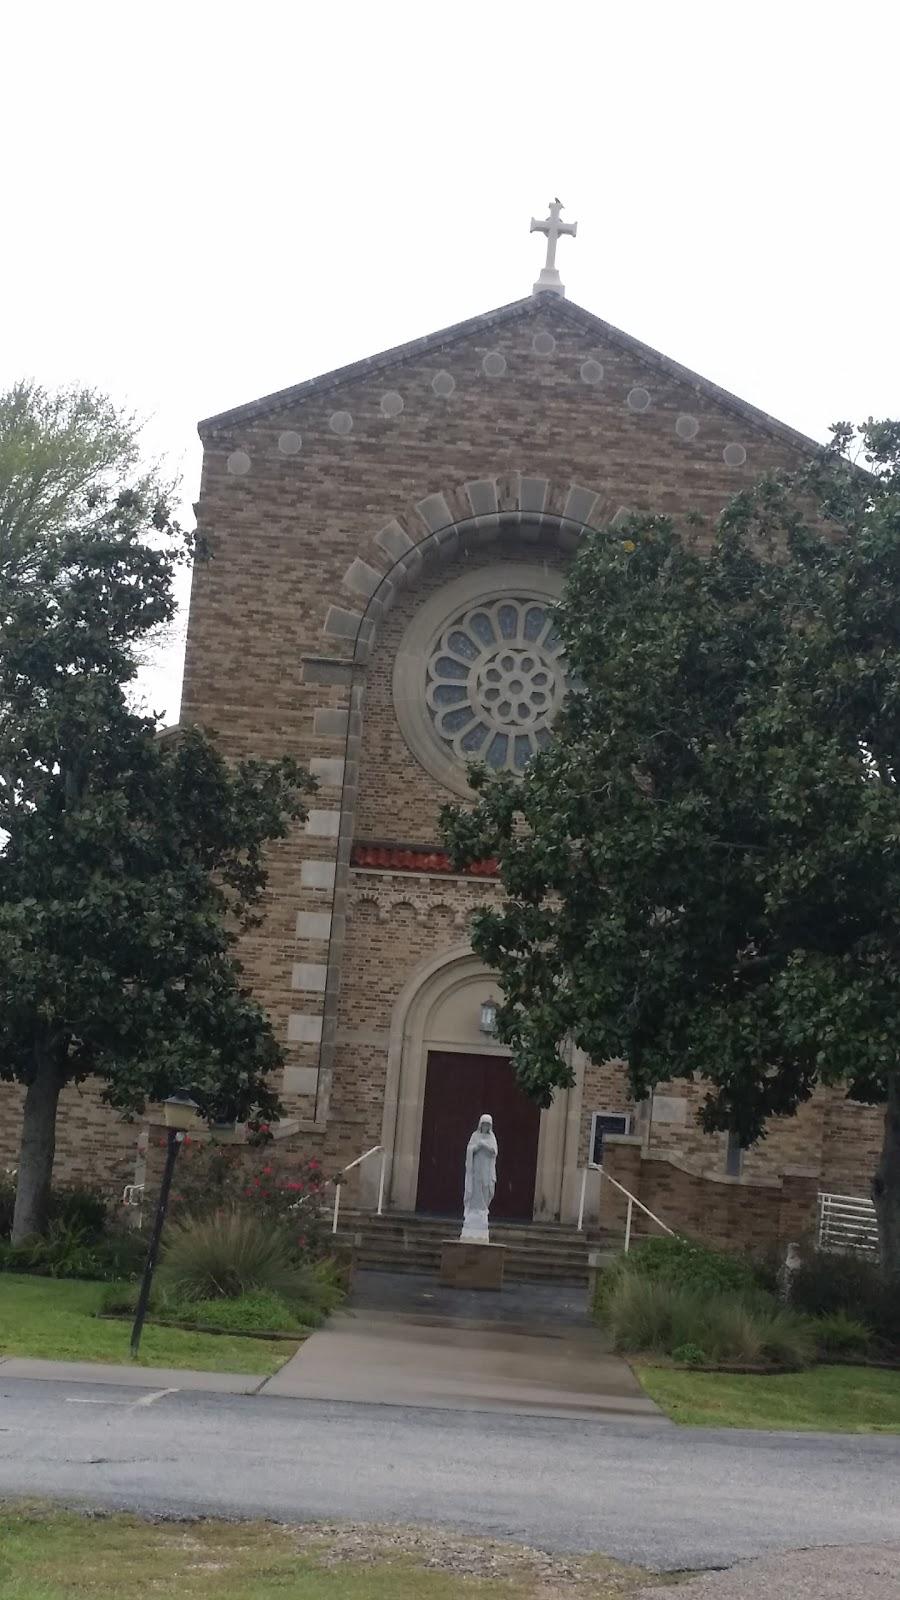 St Marys Church - church    Photo 1 of 10   Address: 816 Park Dr, La Porte, TX 77571, USA   Phone: (281) 471-2000